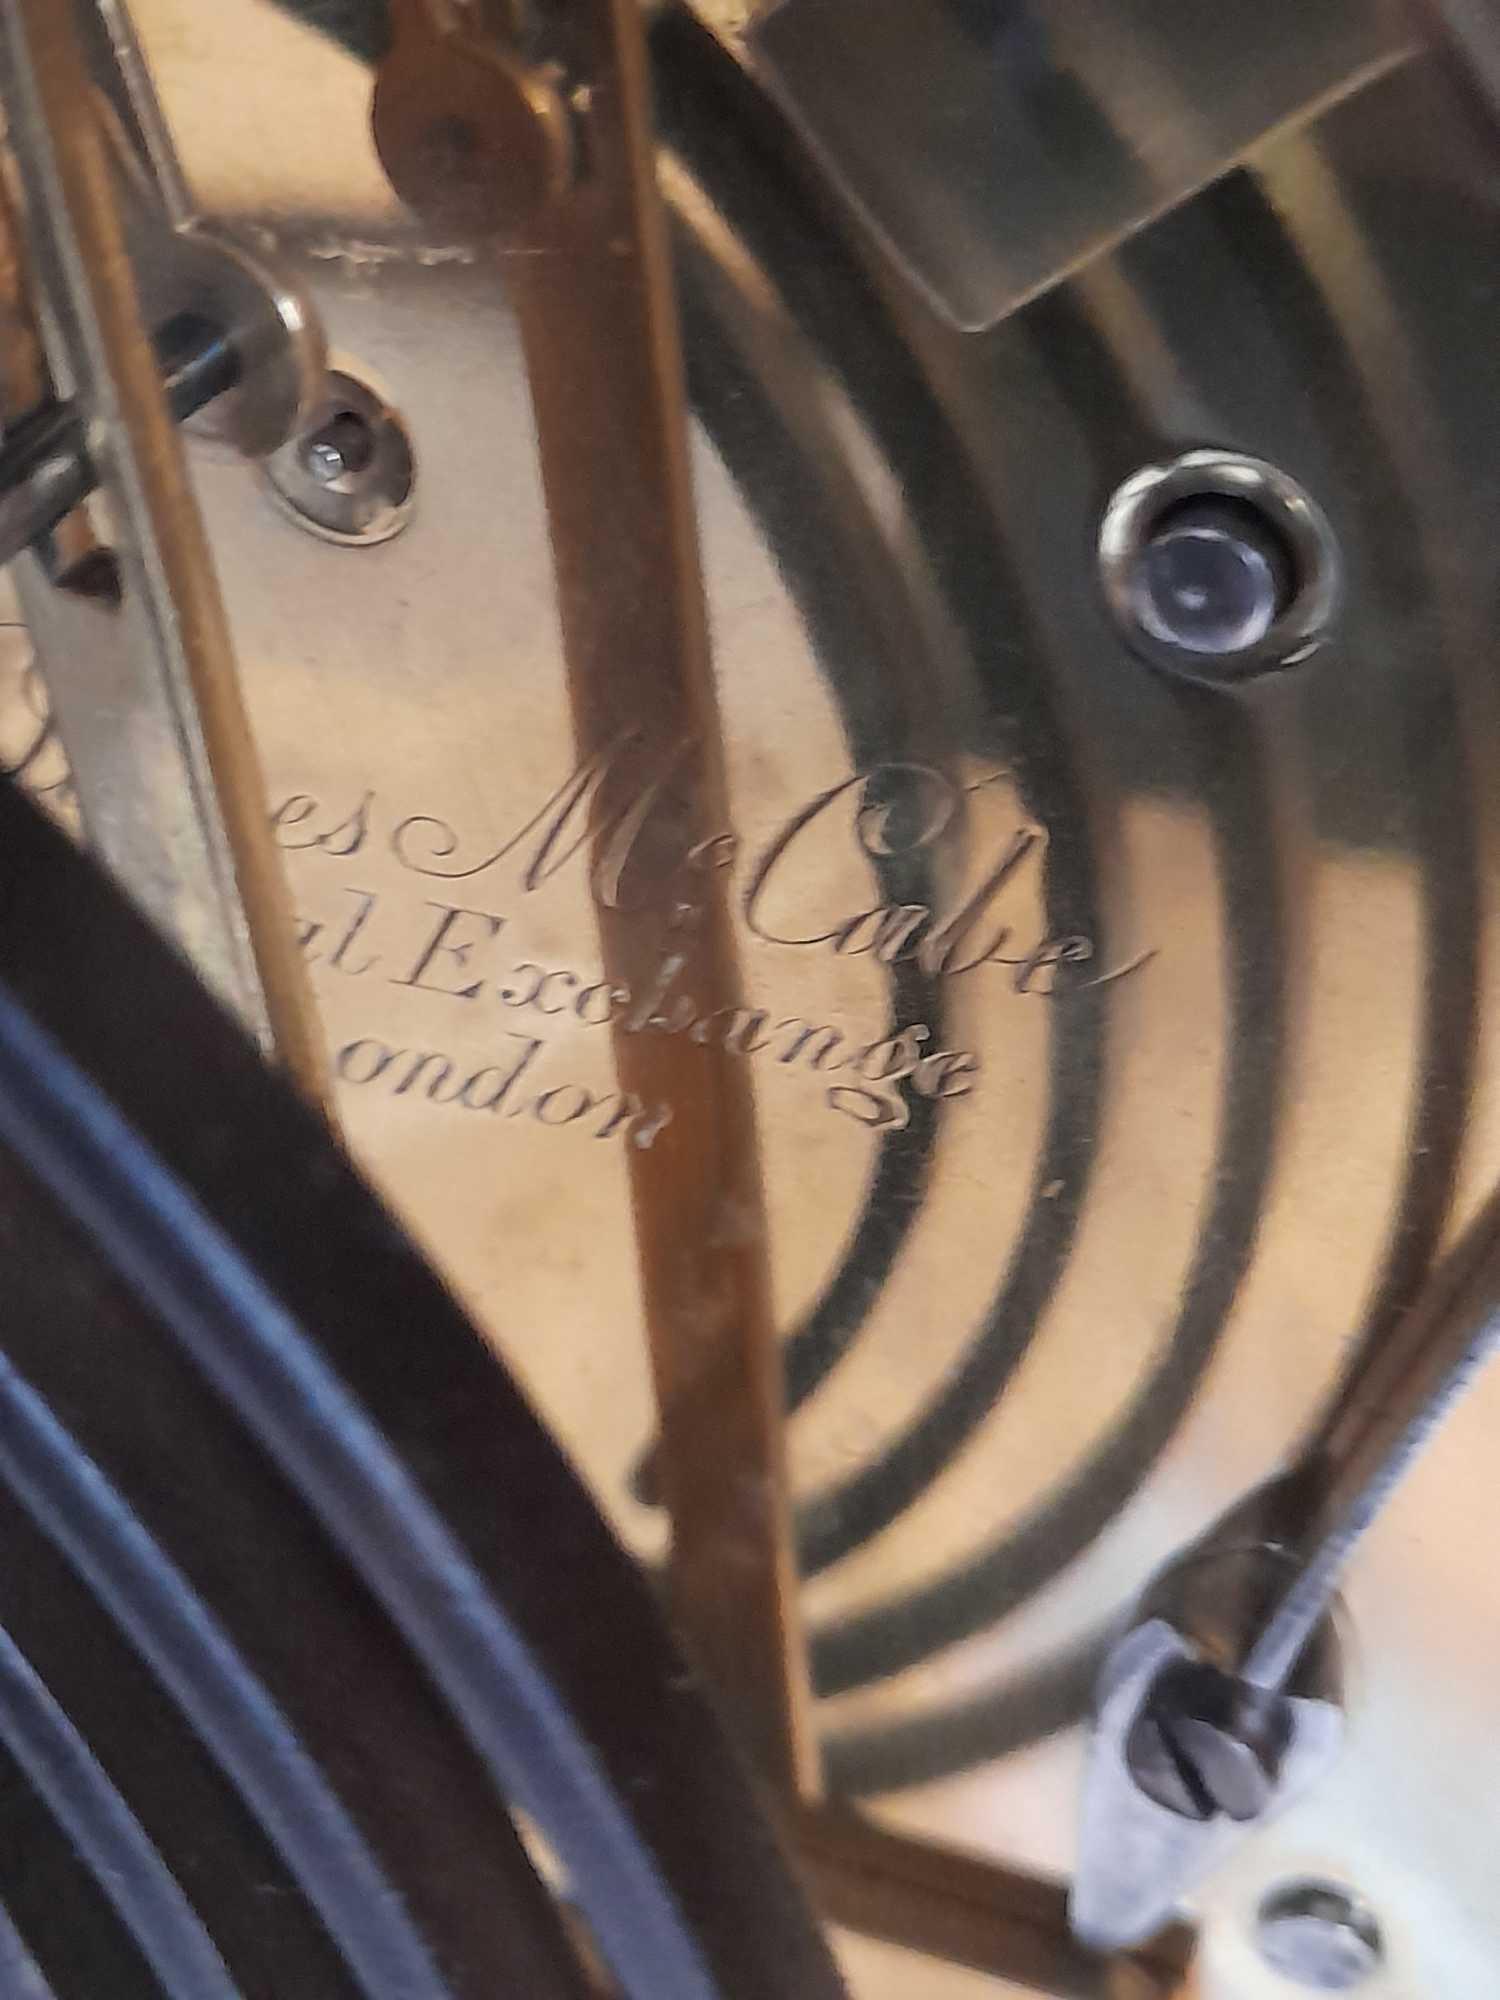 JAMES McCABE LONDON CLOCK - Image 9 of 16